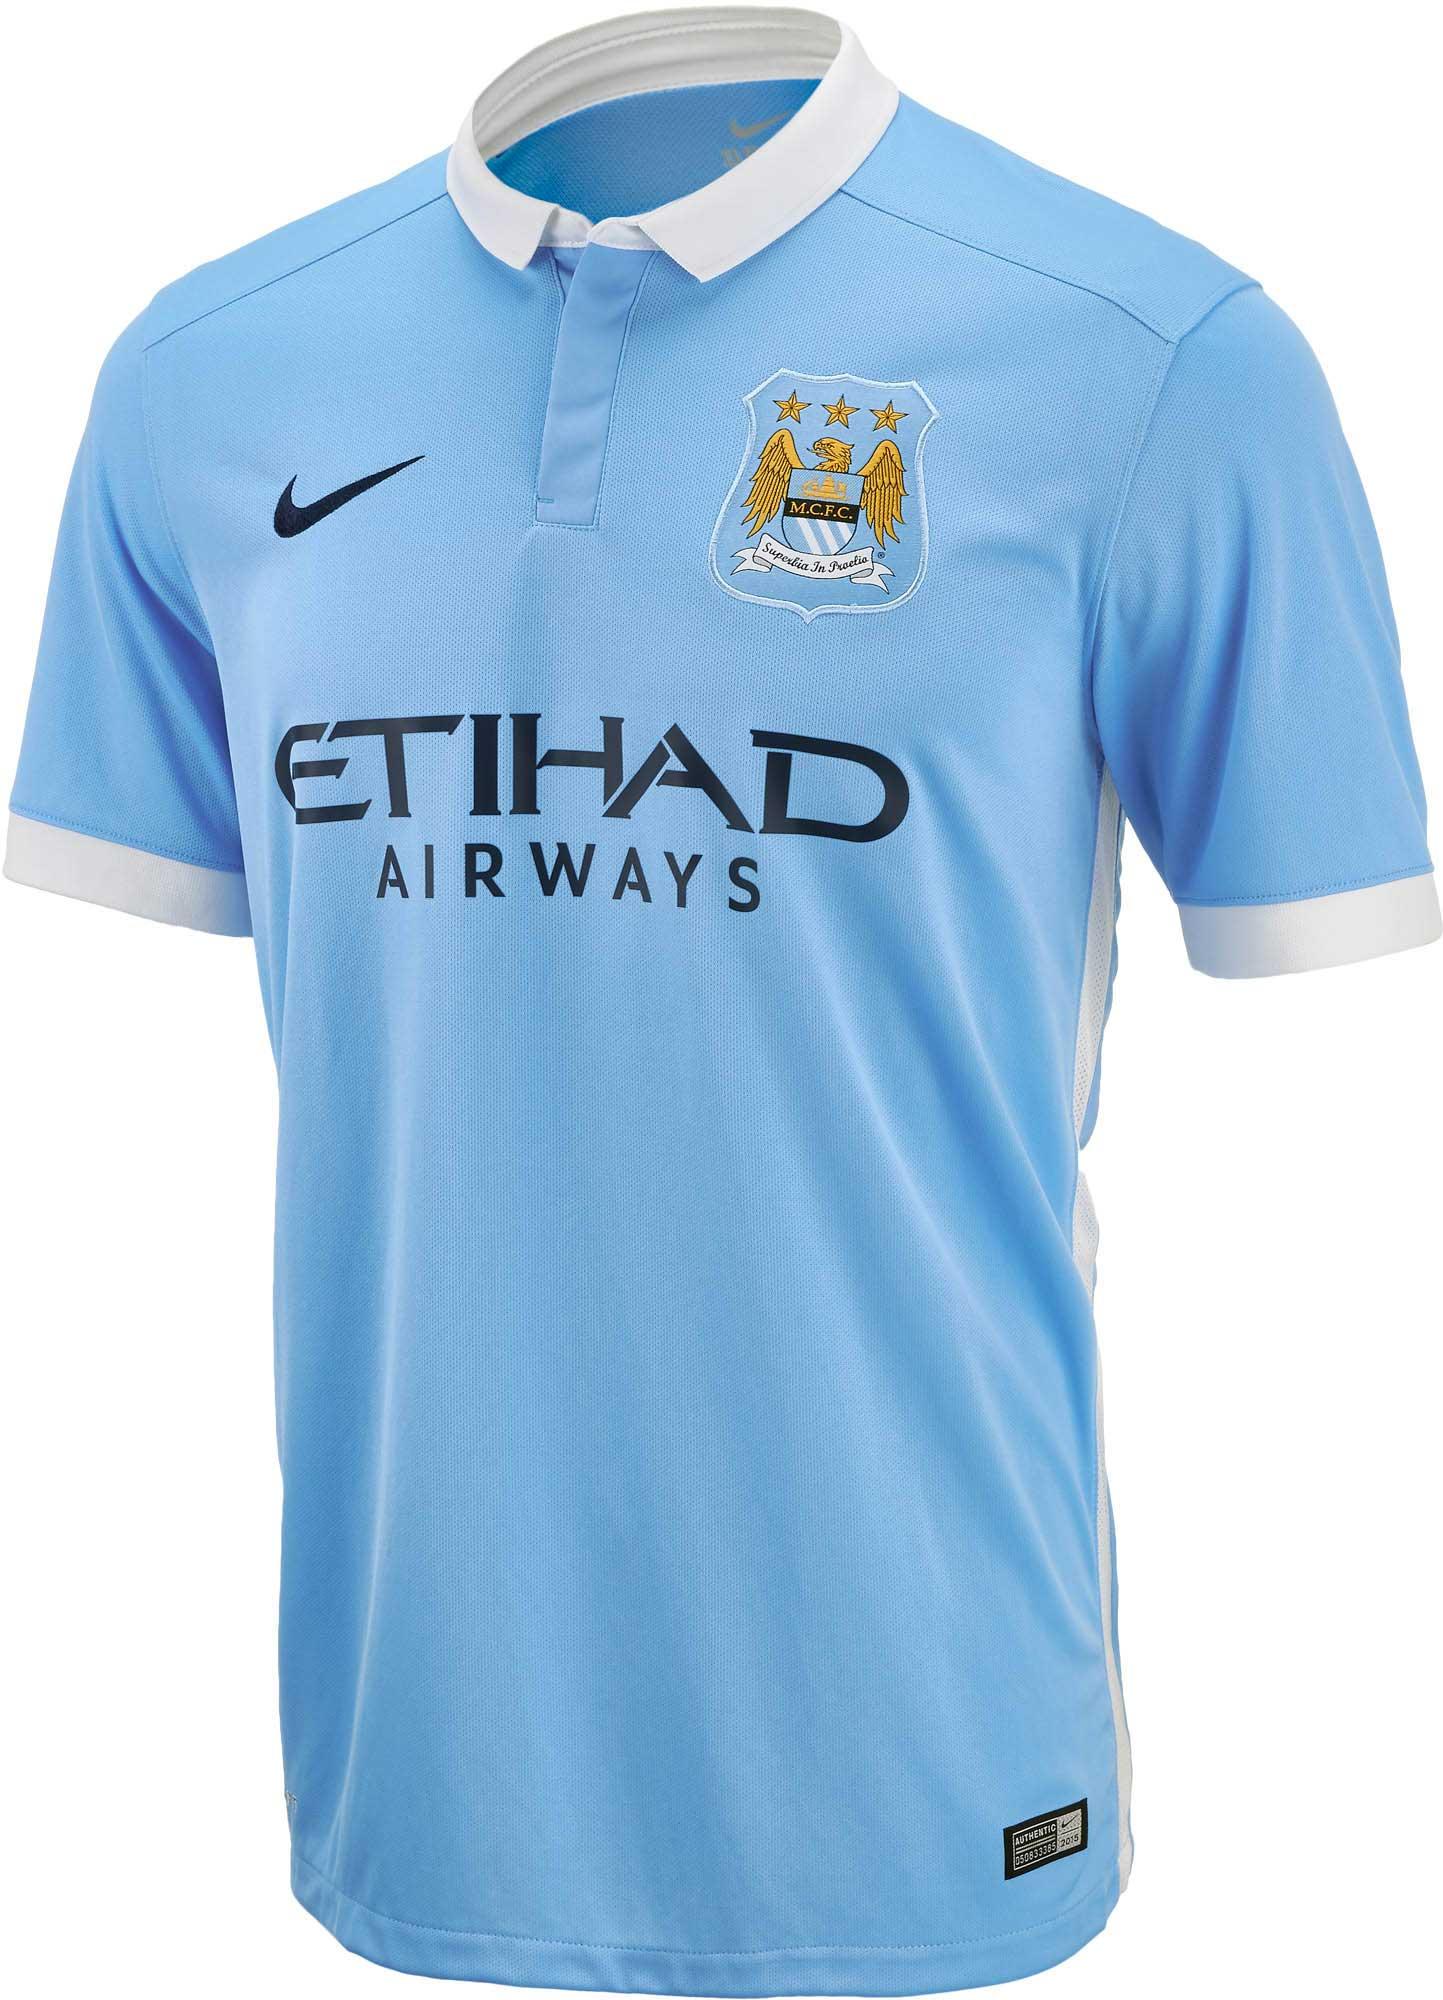 9c10d4510 Kids Nike Manchester City Jersey - 2015 16 Youth Man City Home Jerseys